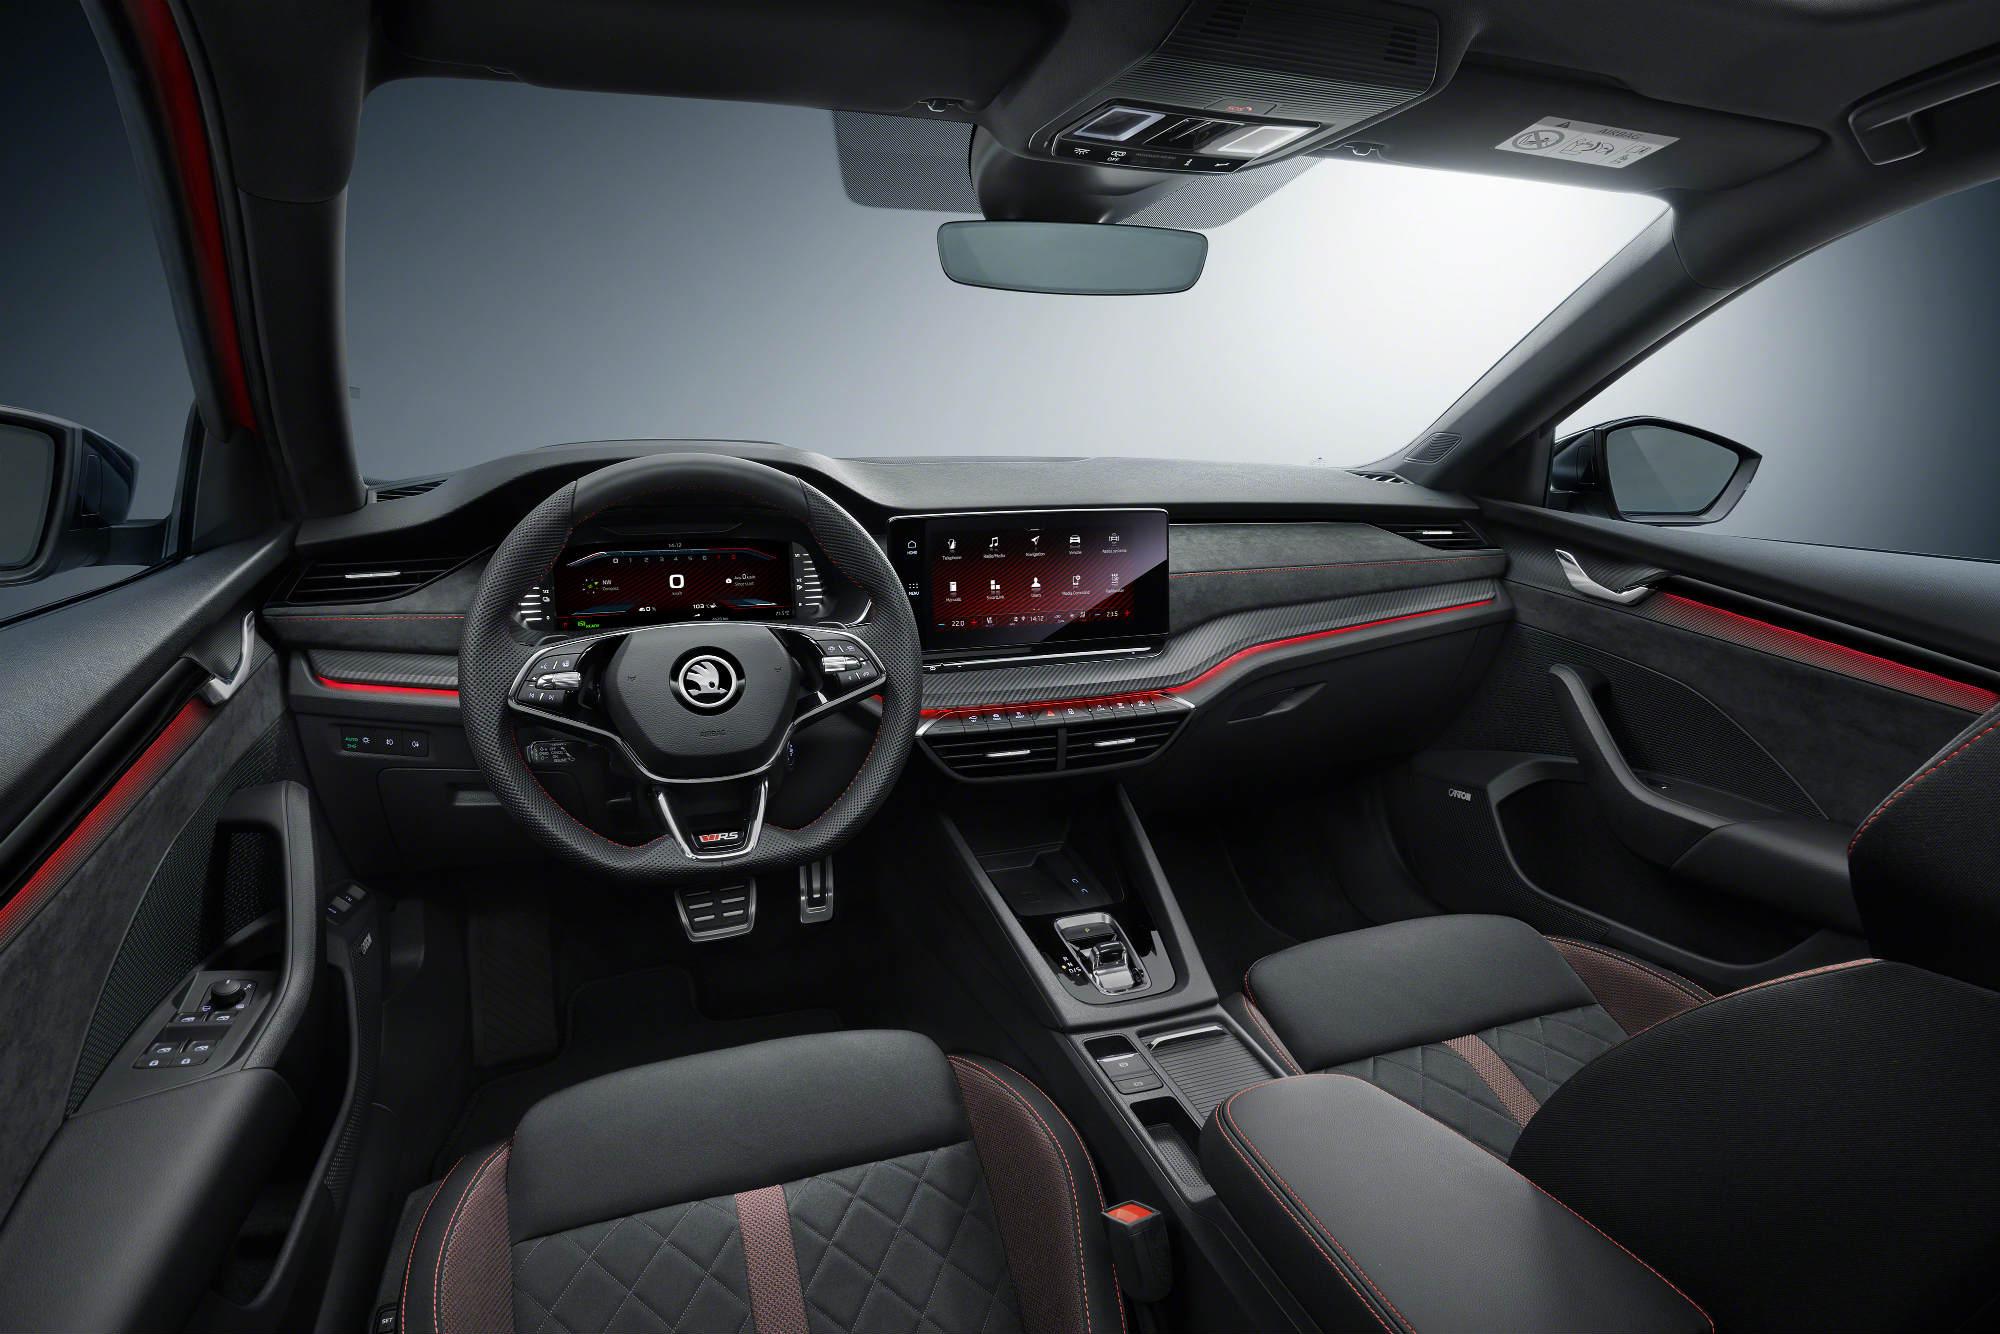 Skoda Octavia RS iV